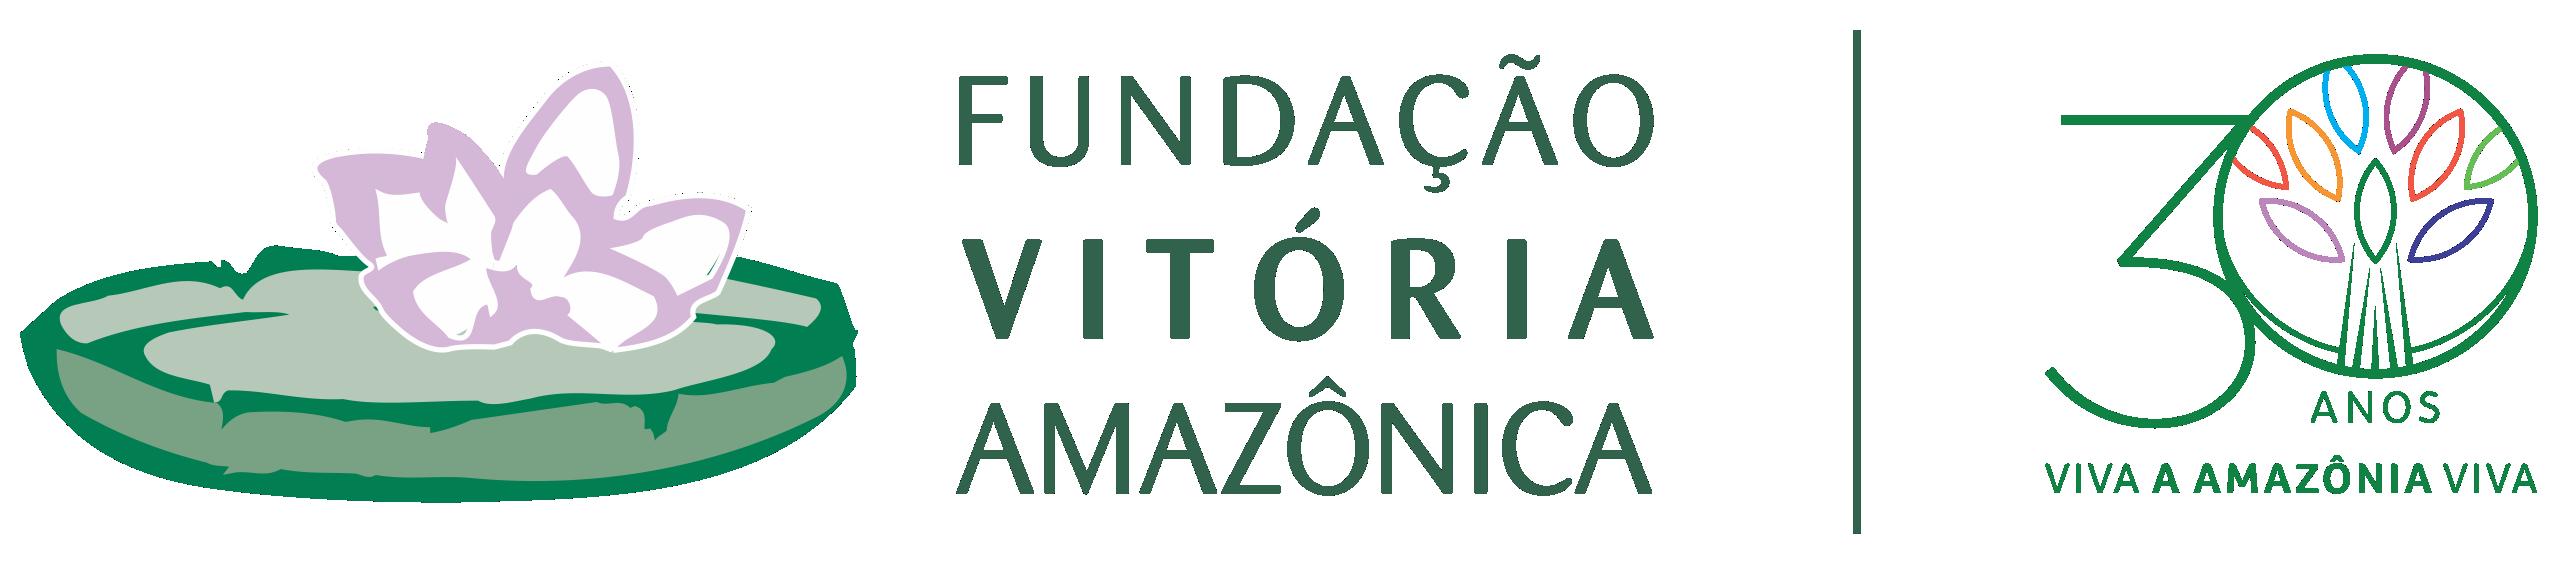 Vitória Amazônica Foundation